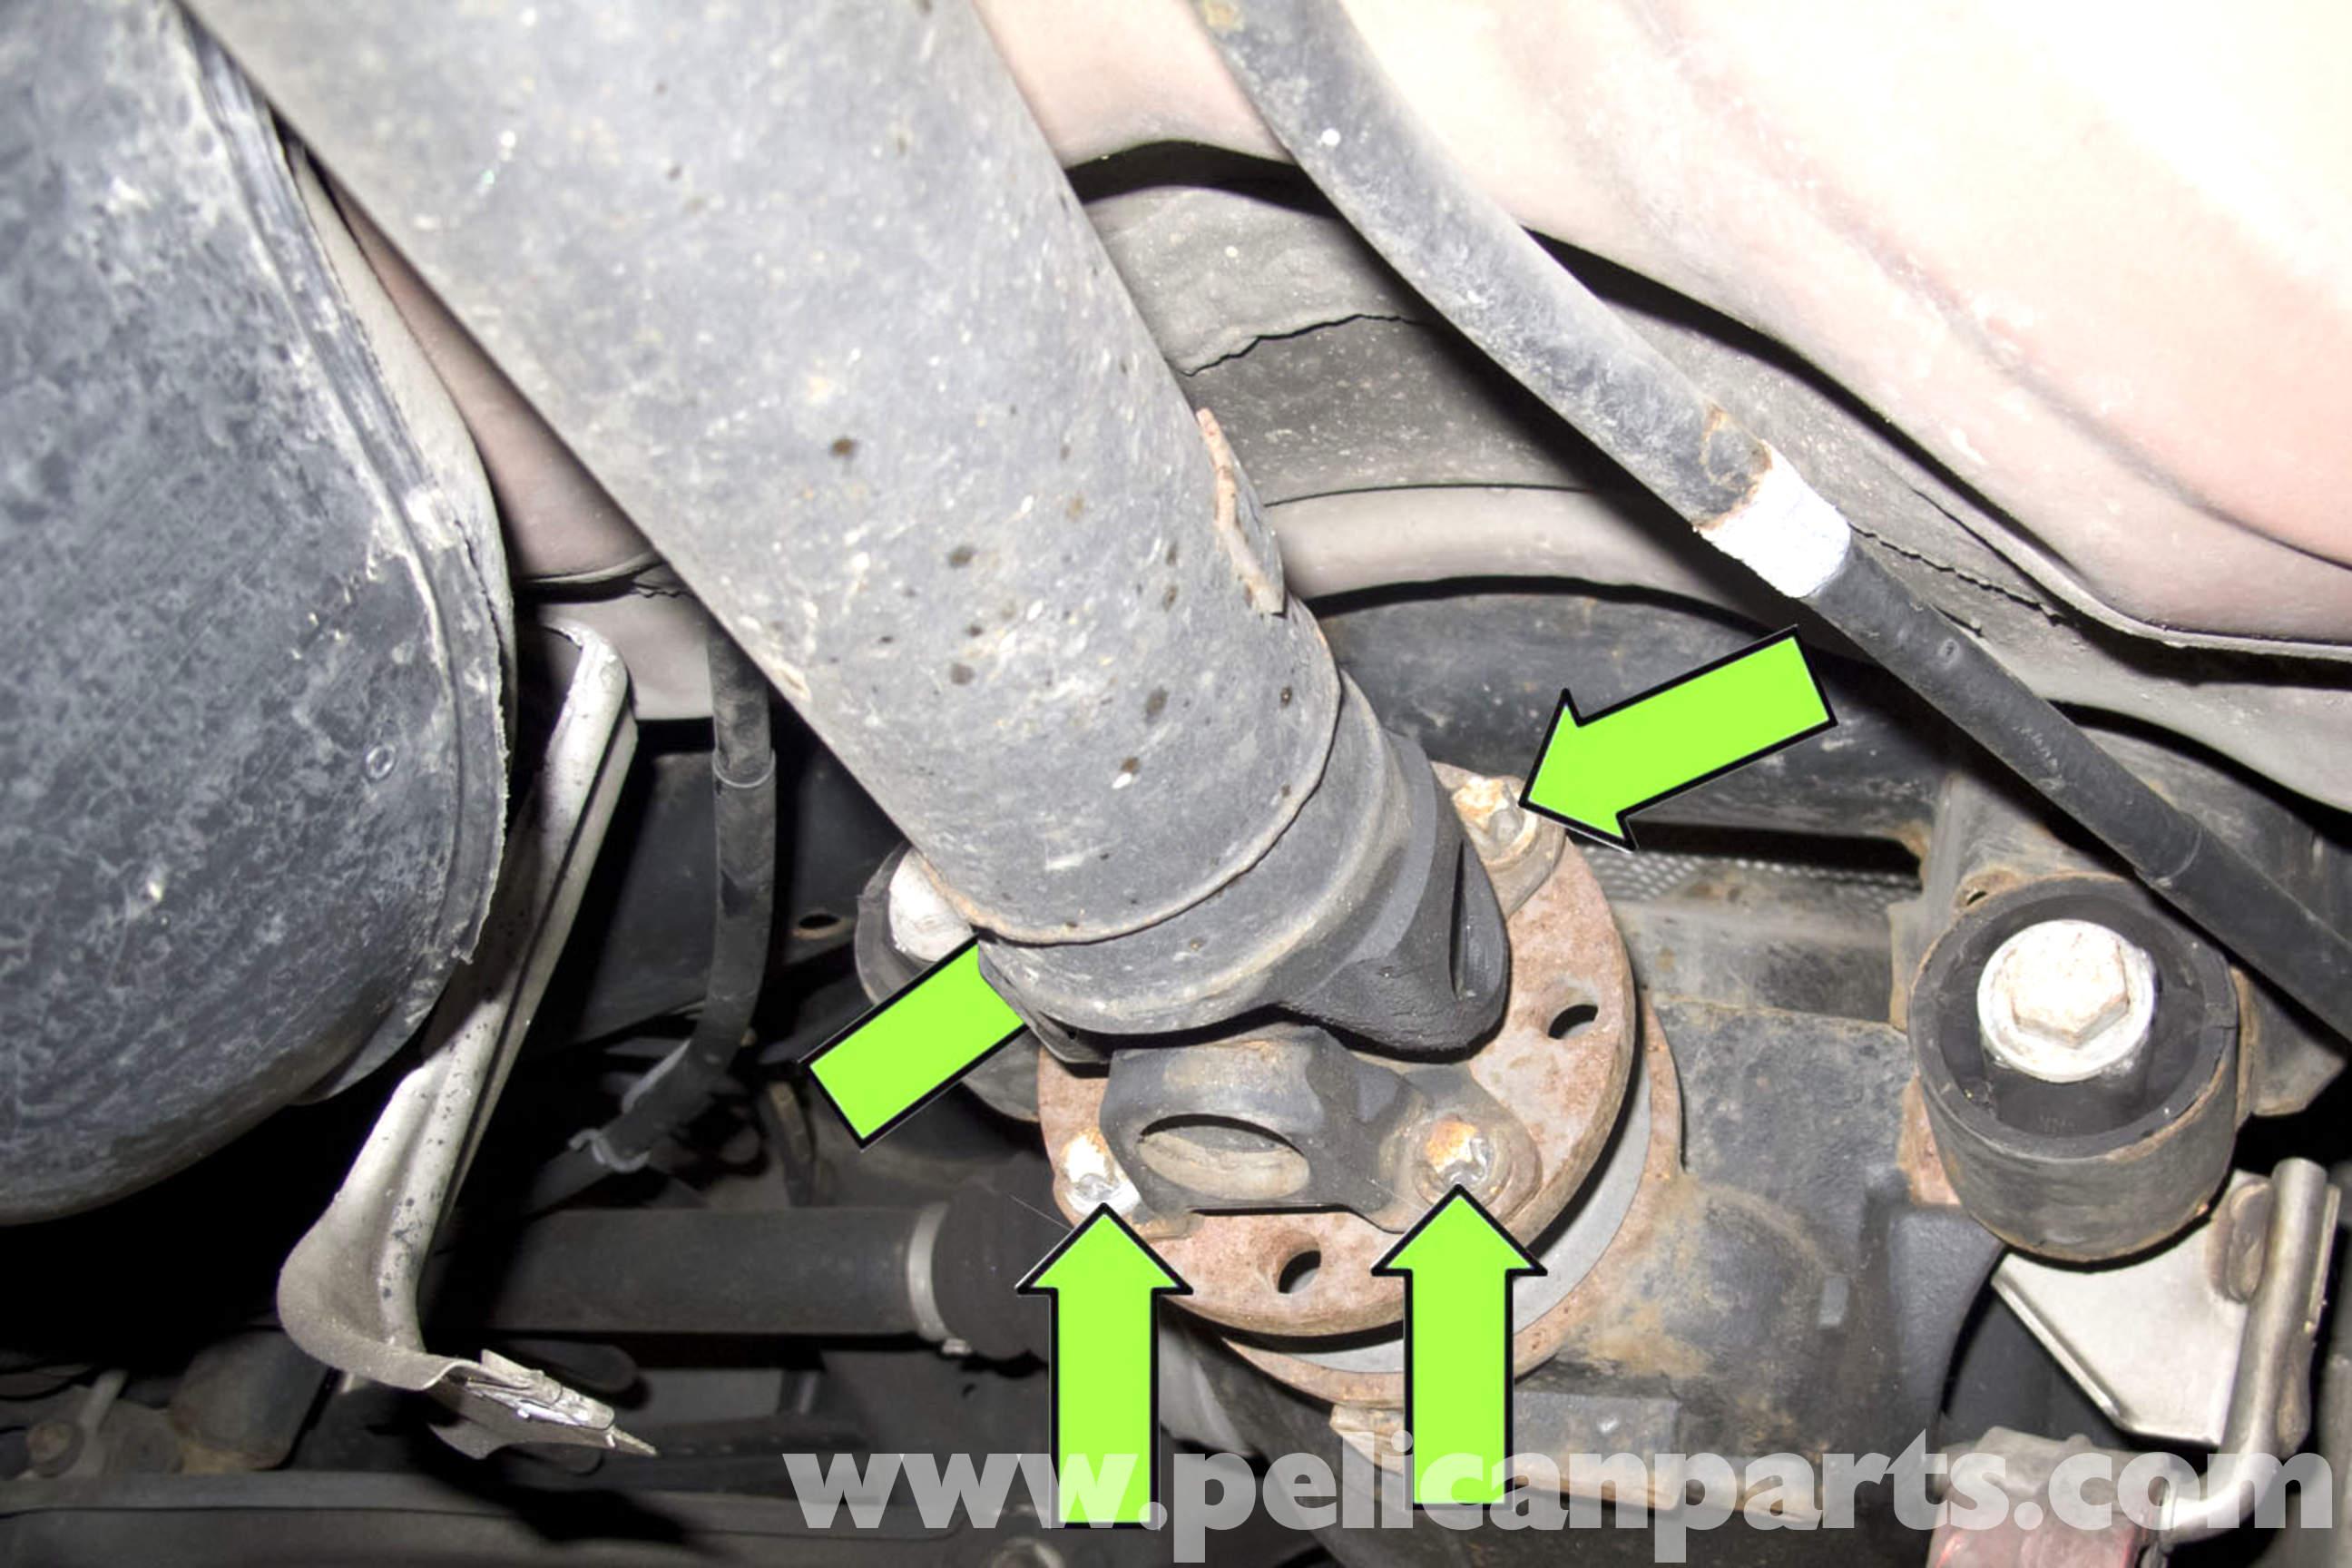 I Wire Diagram Bmw E90 Driveshaft Bearing Replacement E91 E92 E93